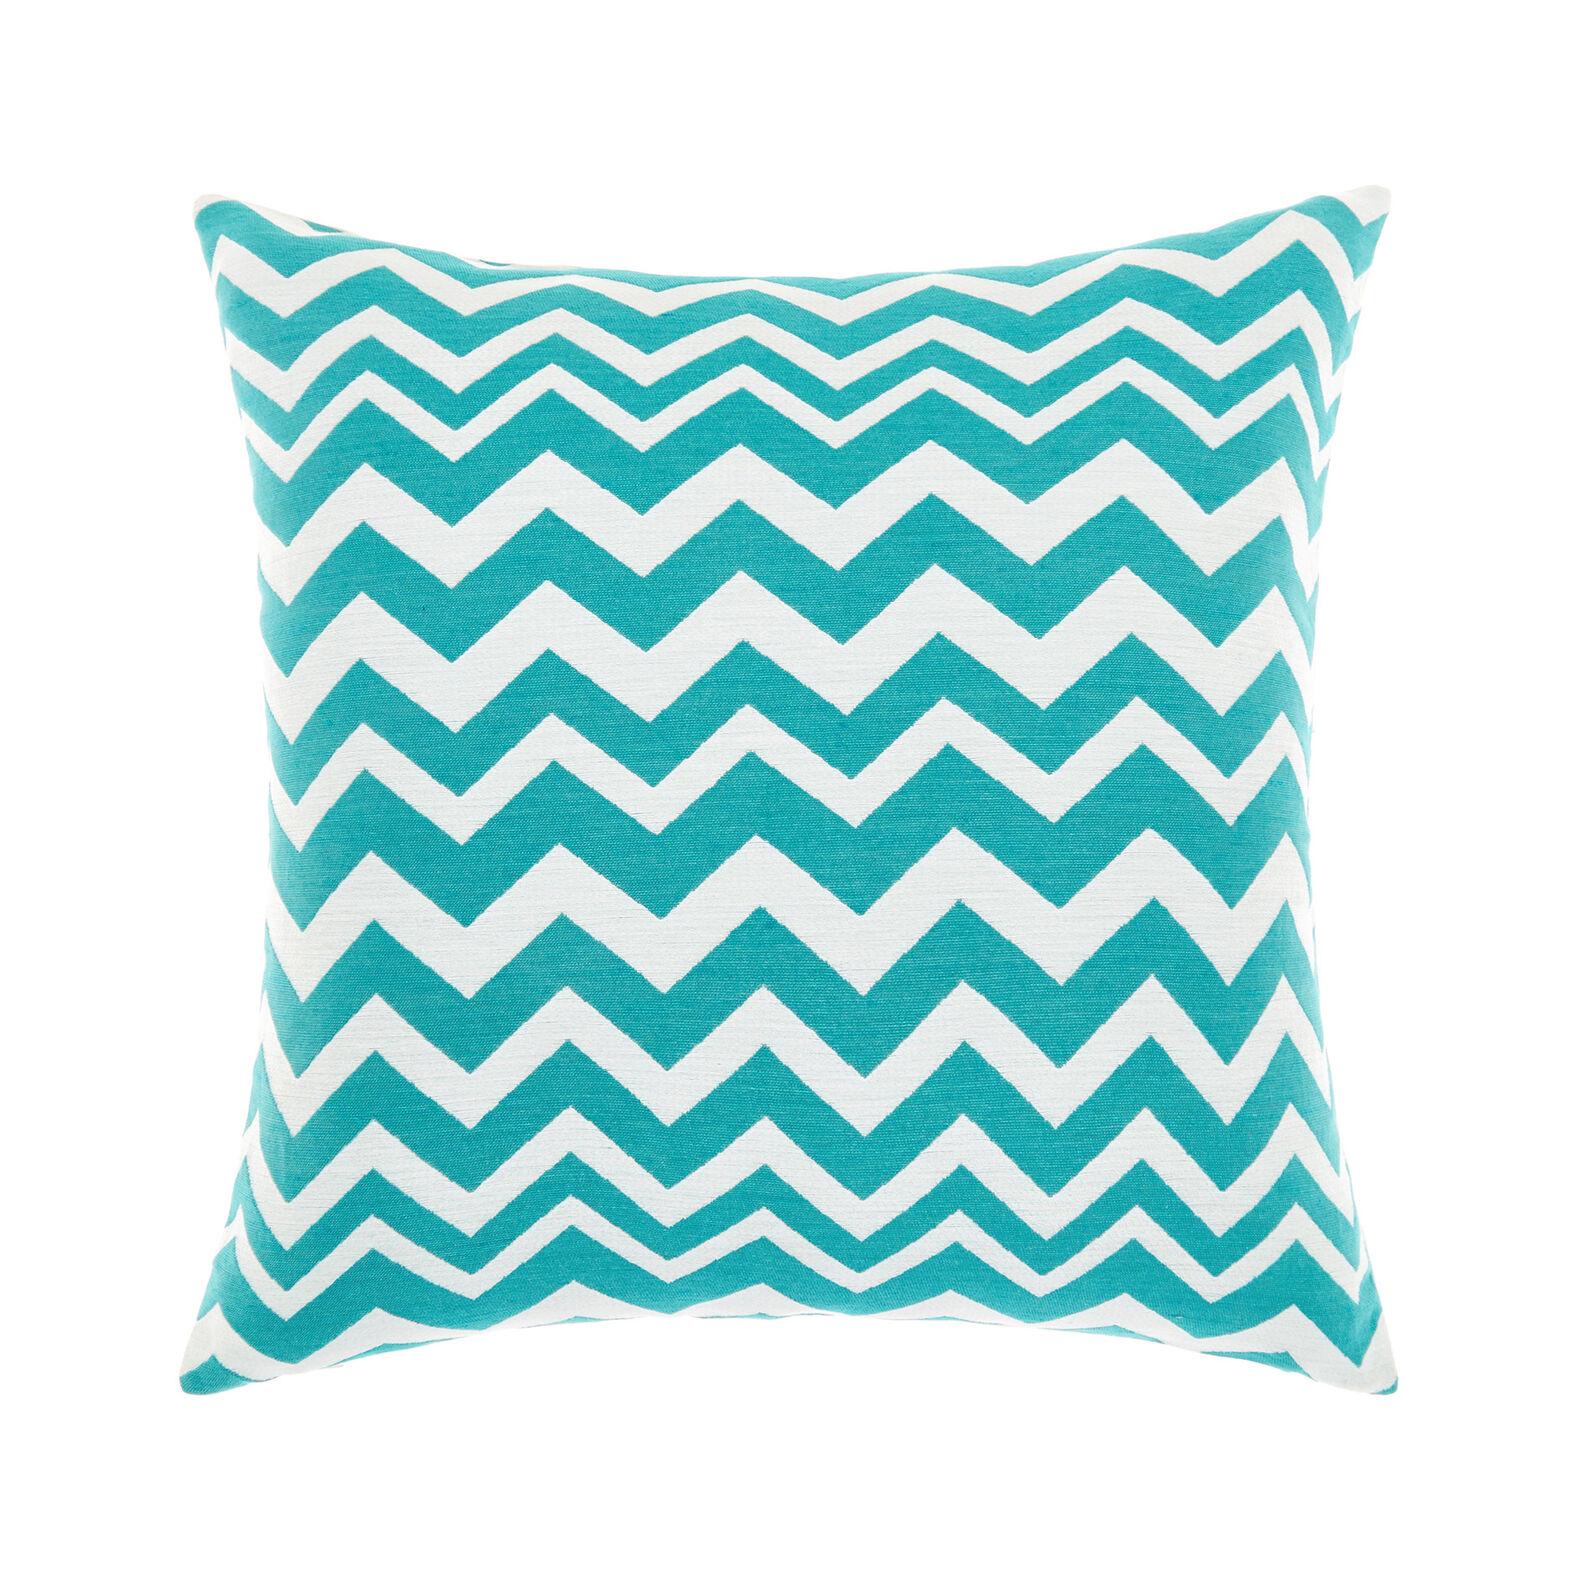 Zigzag striped jacquard cushion